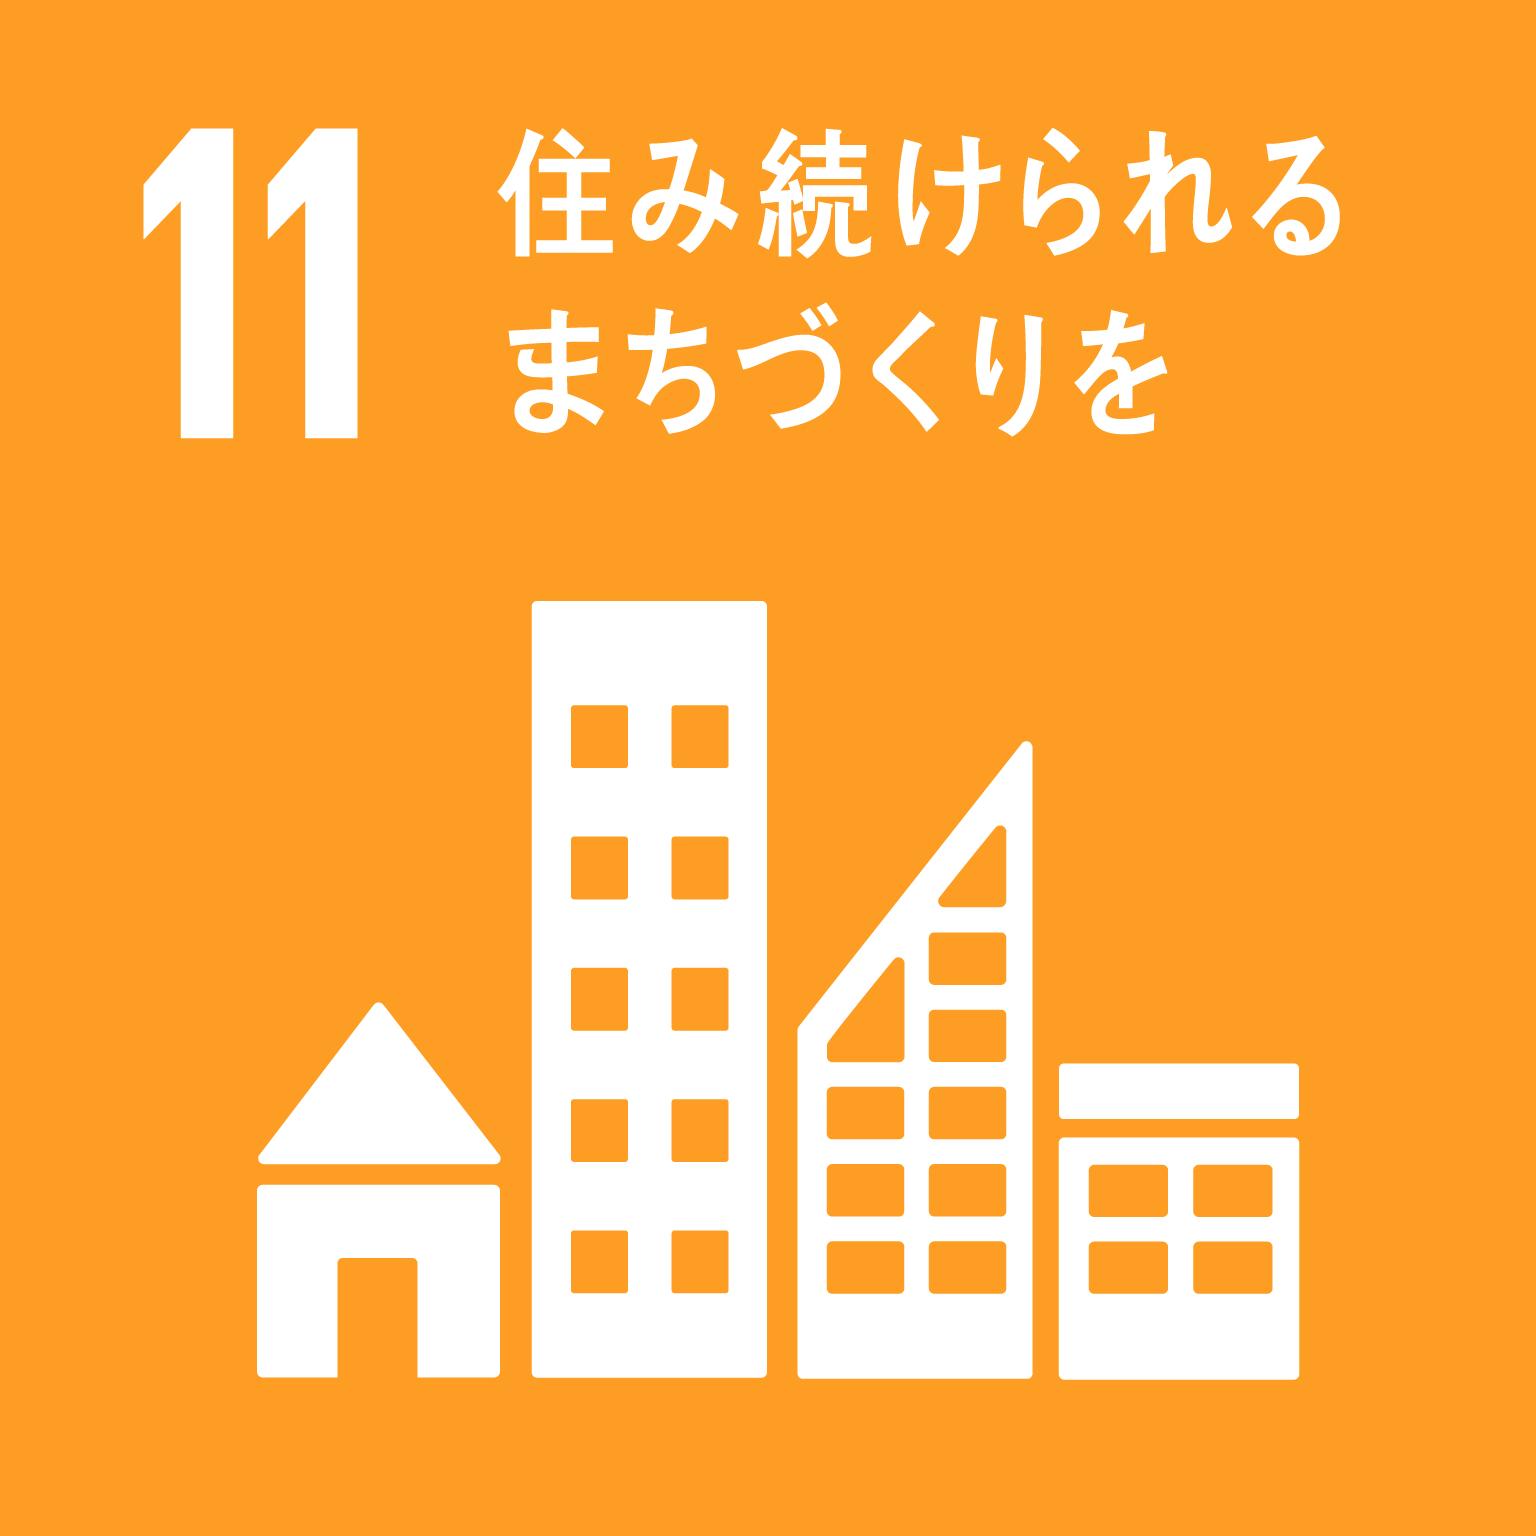 https://www.tut.ac.jp/about/images/sdg_icon_11_ja.png